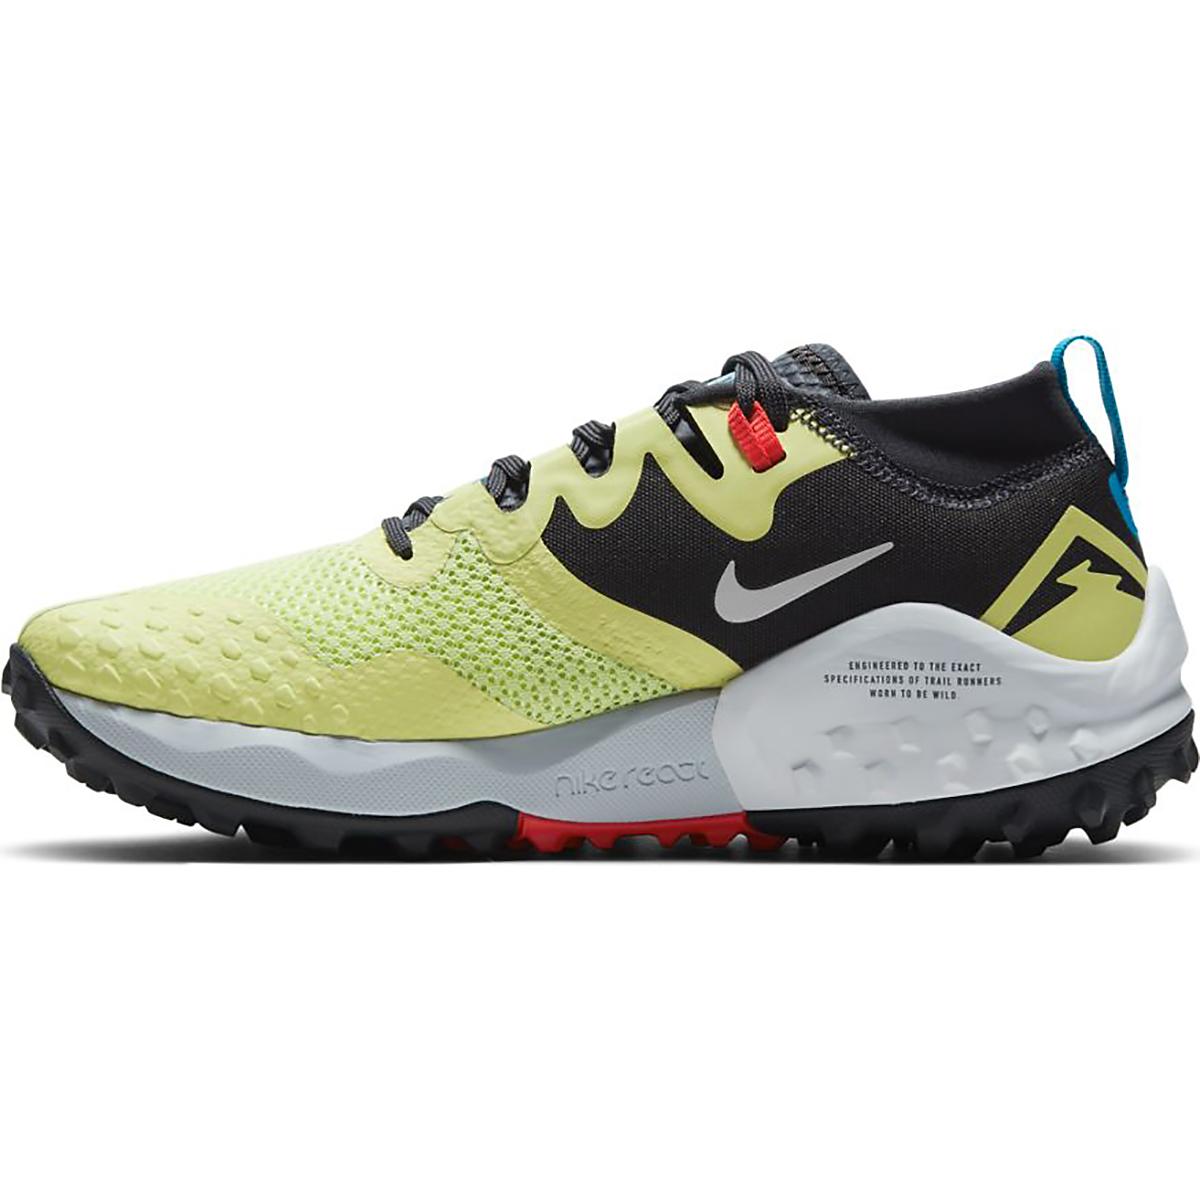 Women's Nike Wildhorse 7 Trail Running Shoe - Color: Limelight/Off Noir-Laser Blue-Chile Red - Size: 5 - Width: Regular, Limelight/Off Noir-Laser Blue-Chile Red, large, image 2